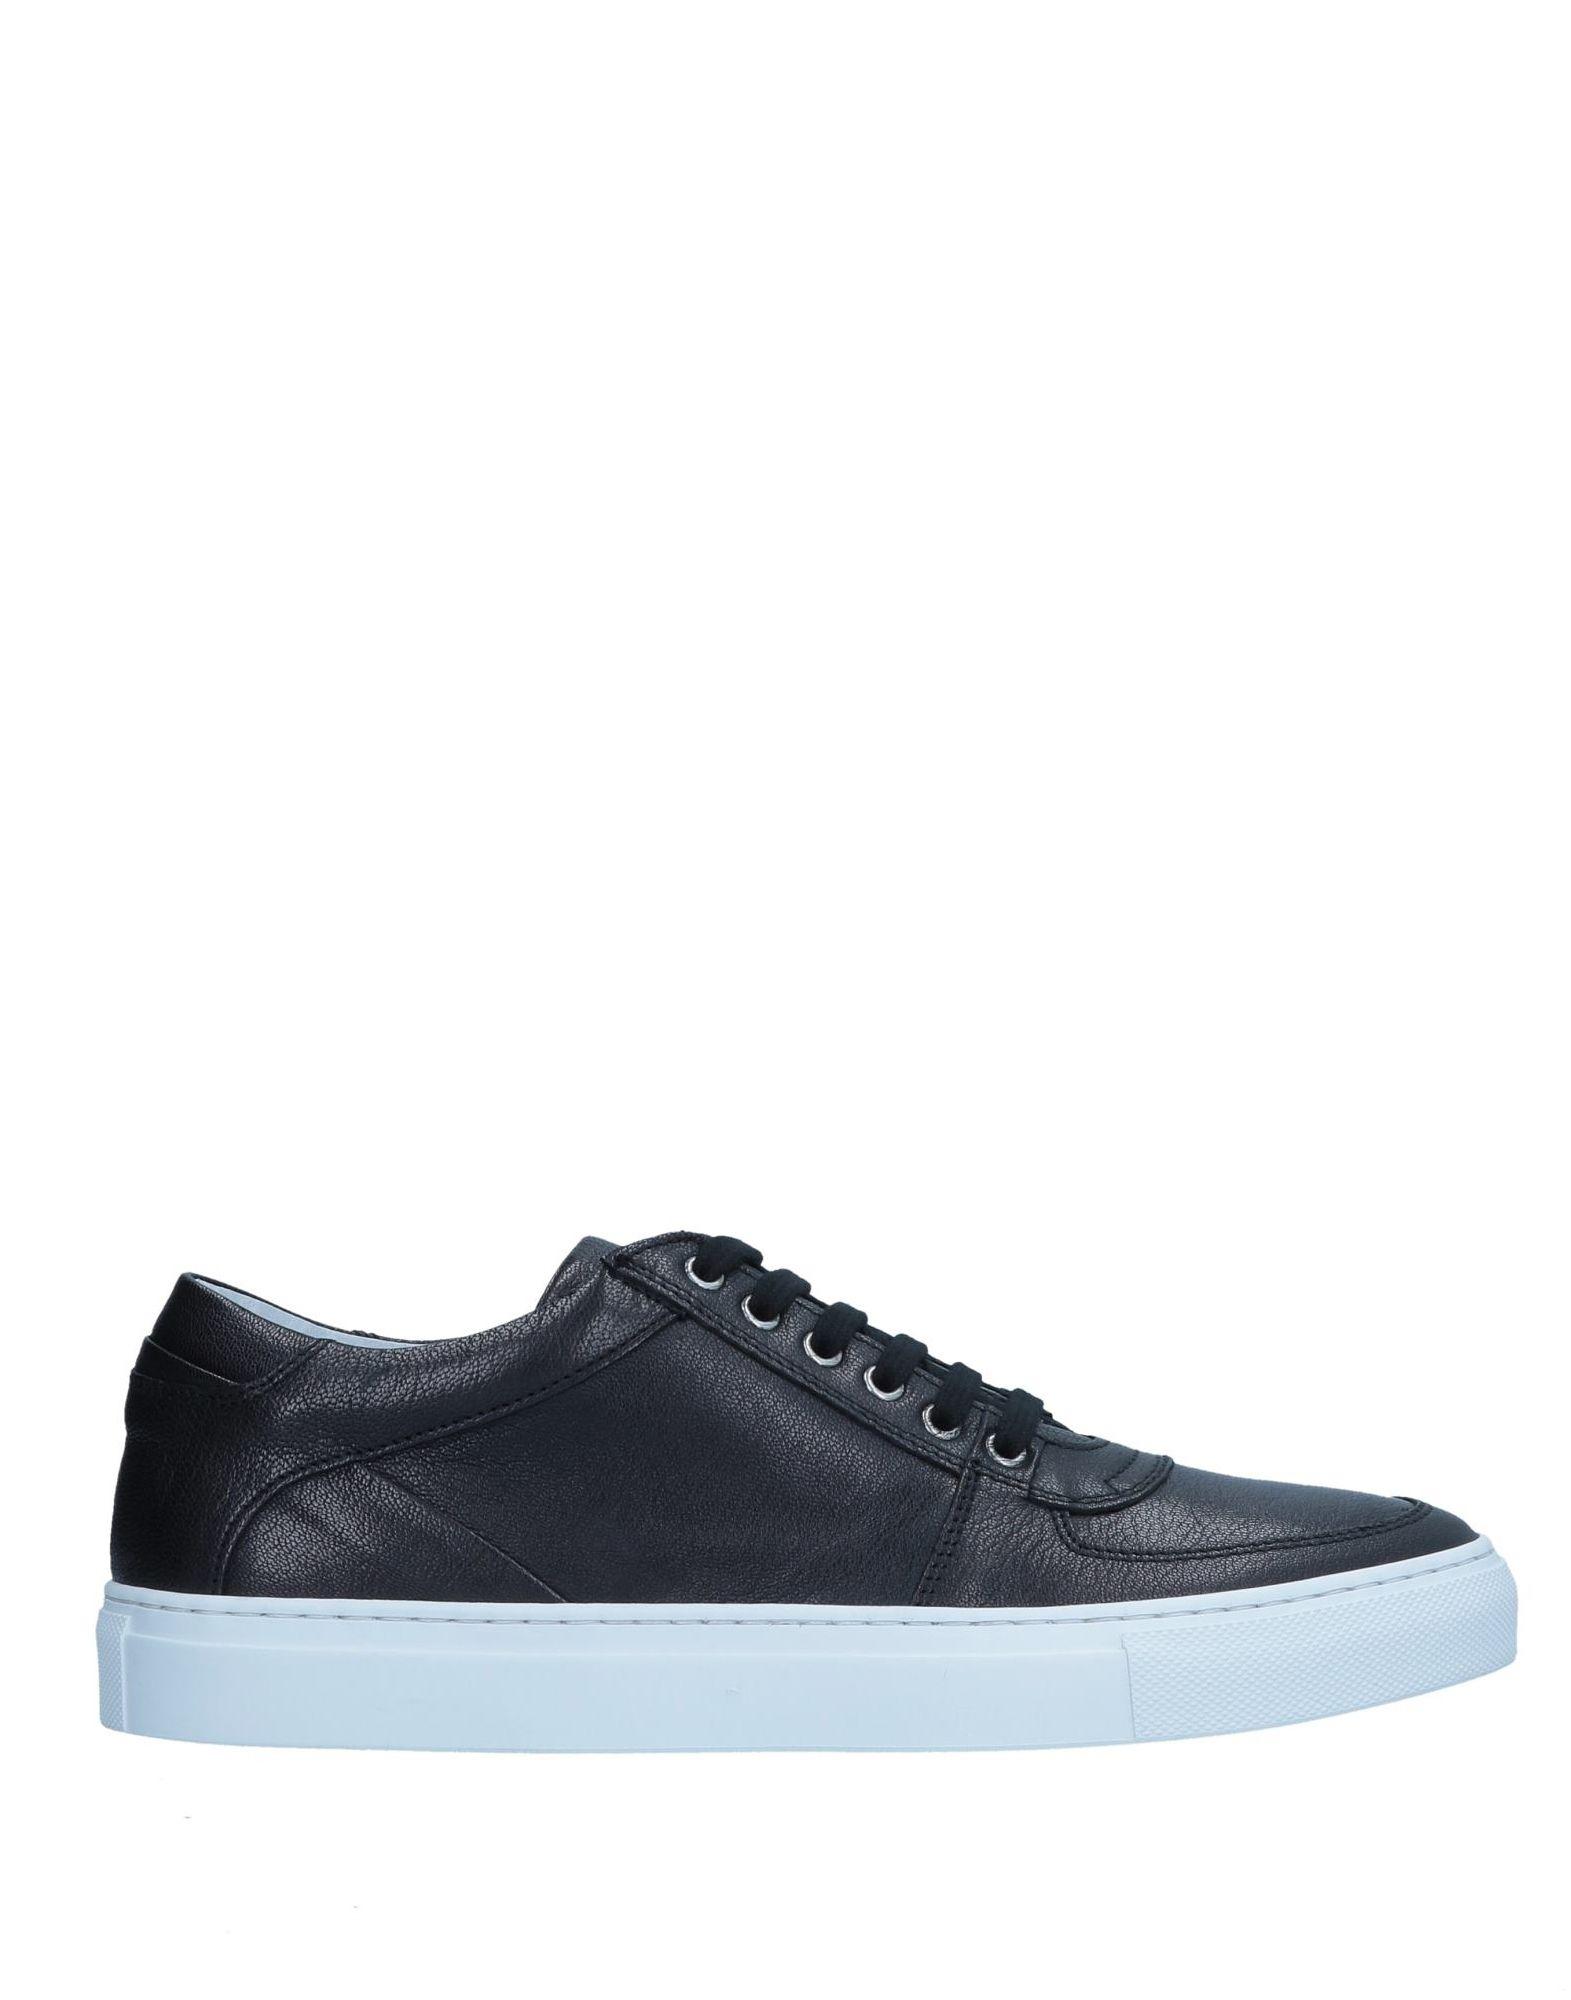 Sneakers Fabiano Ricci Homme - Sneakers Fabiano Ricci  Noir Confortable et belle